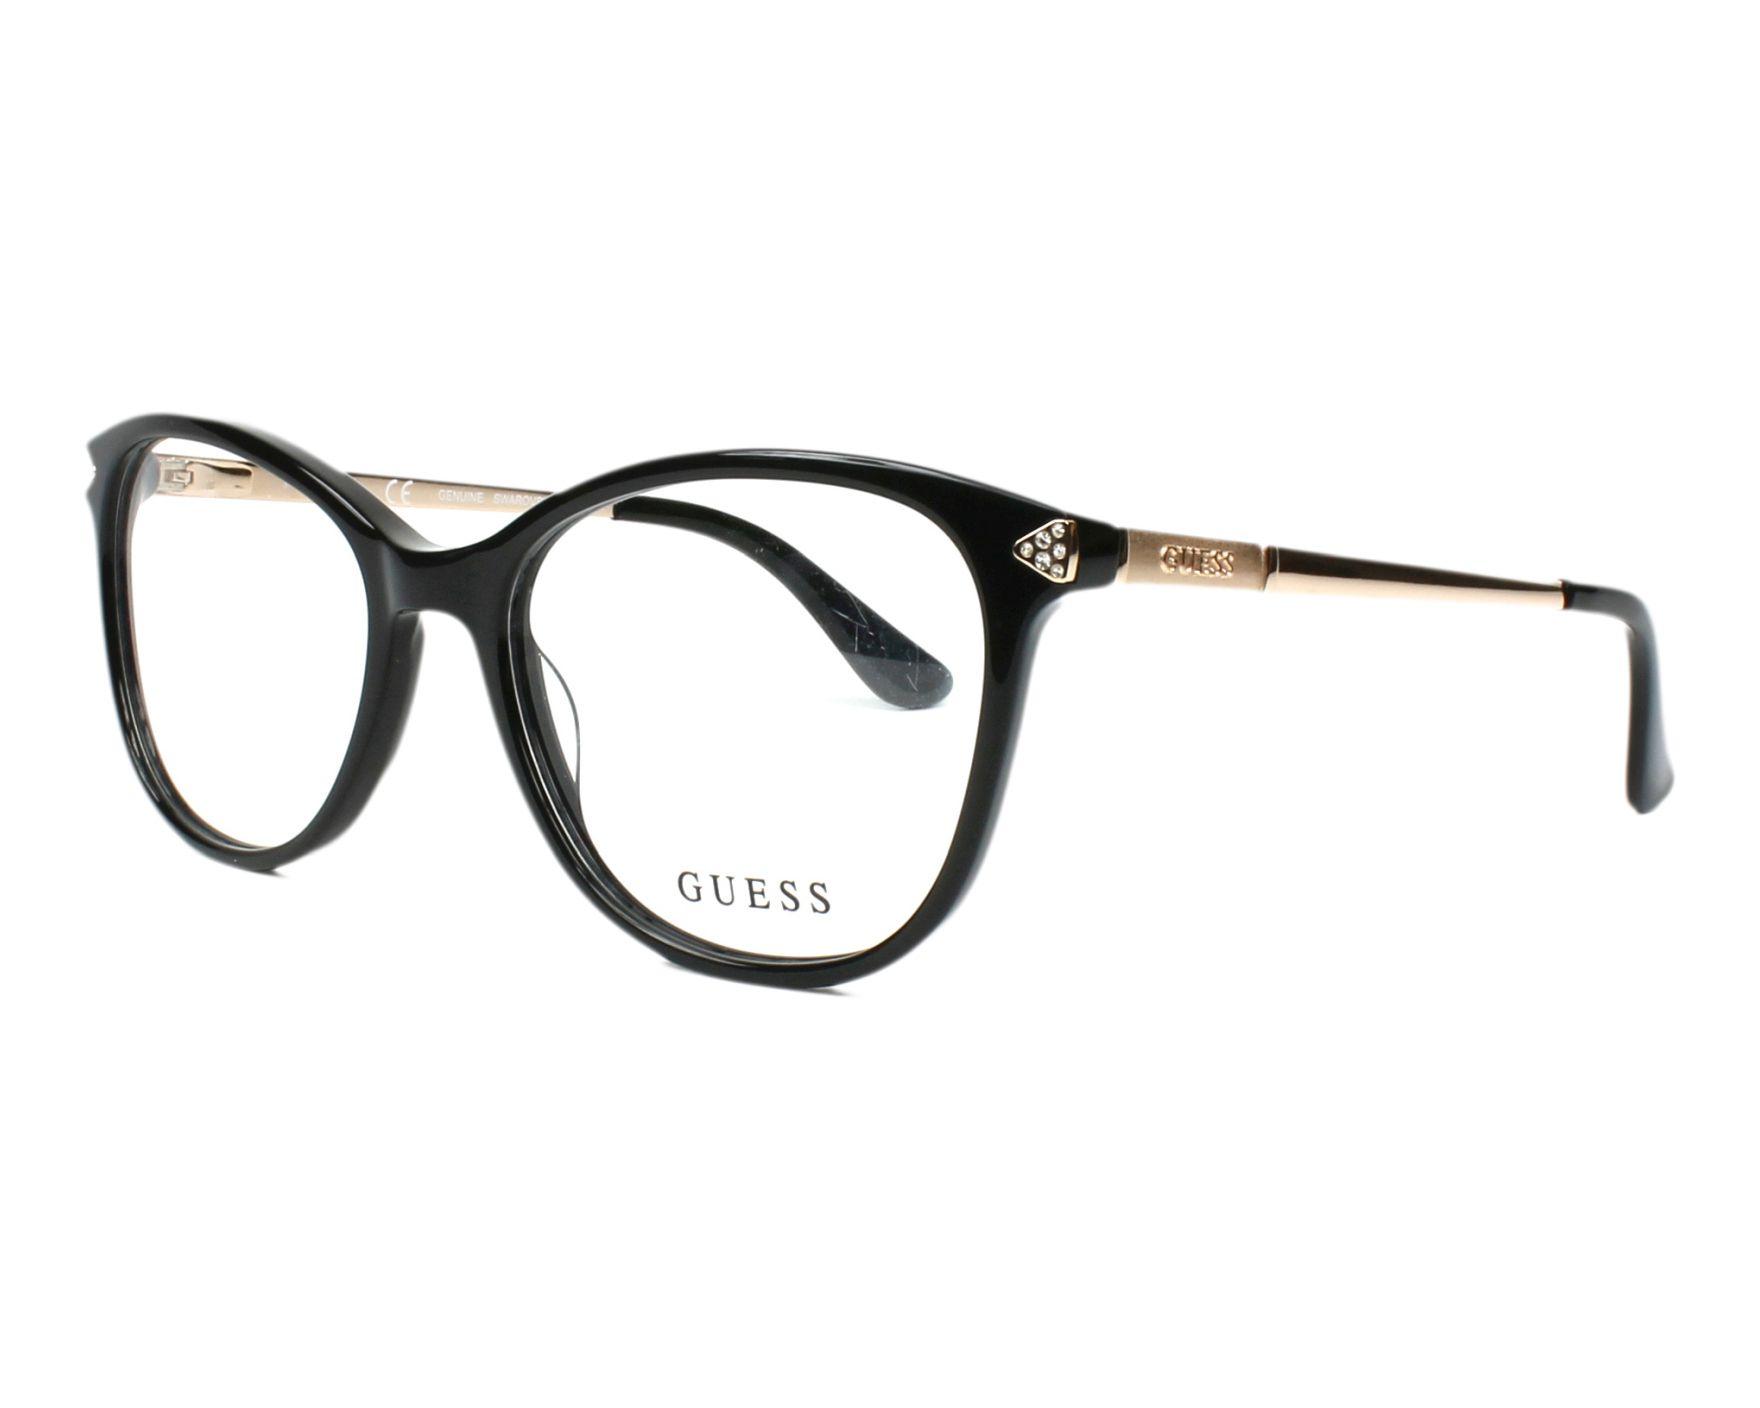 Guess Eyeglasses Black GU-2632-S 005 - Visionet US